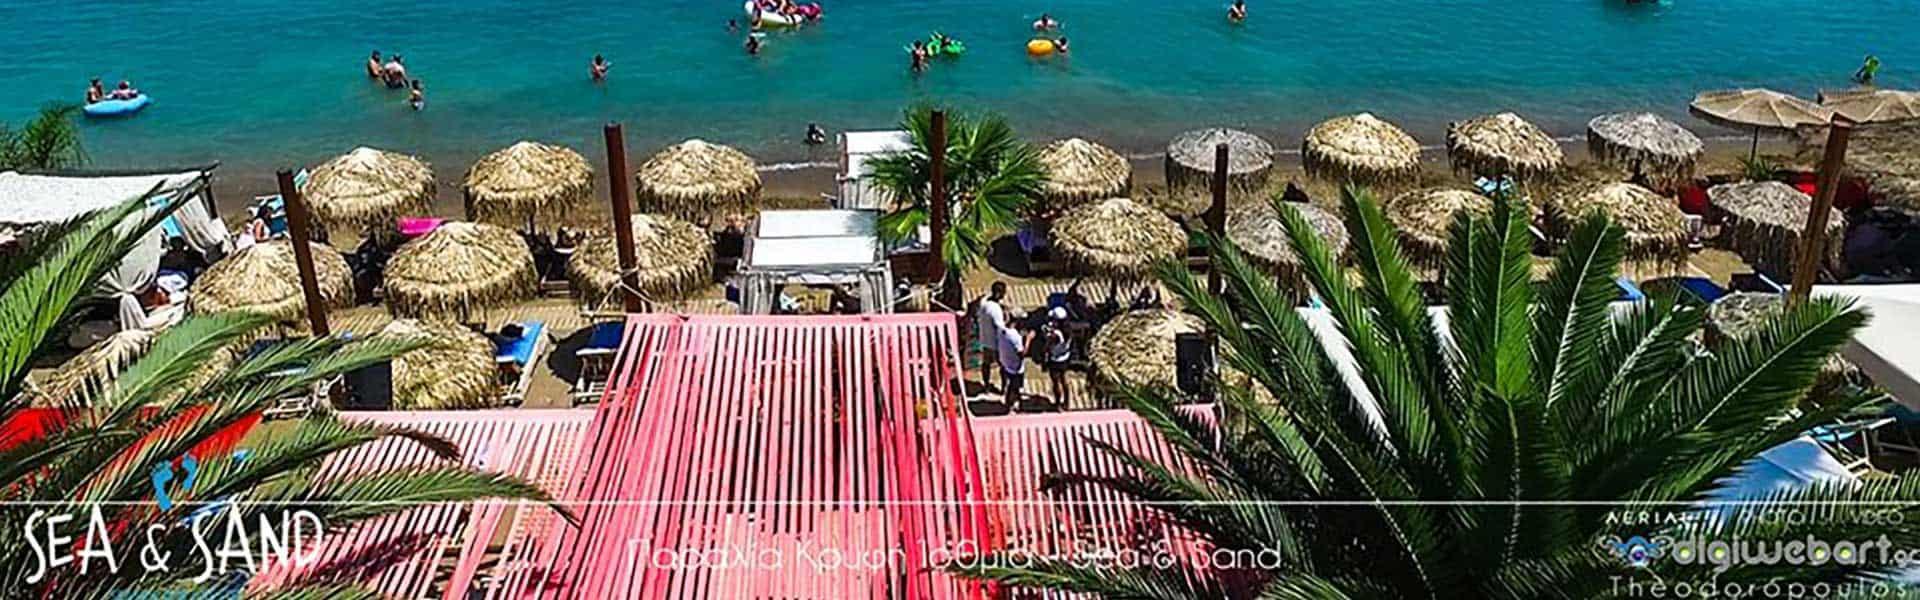 sea and sand panoramic view